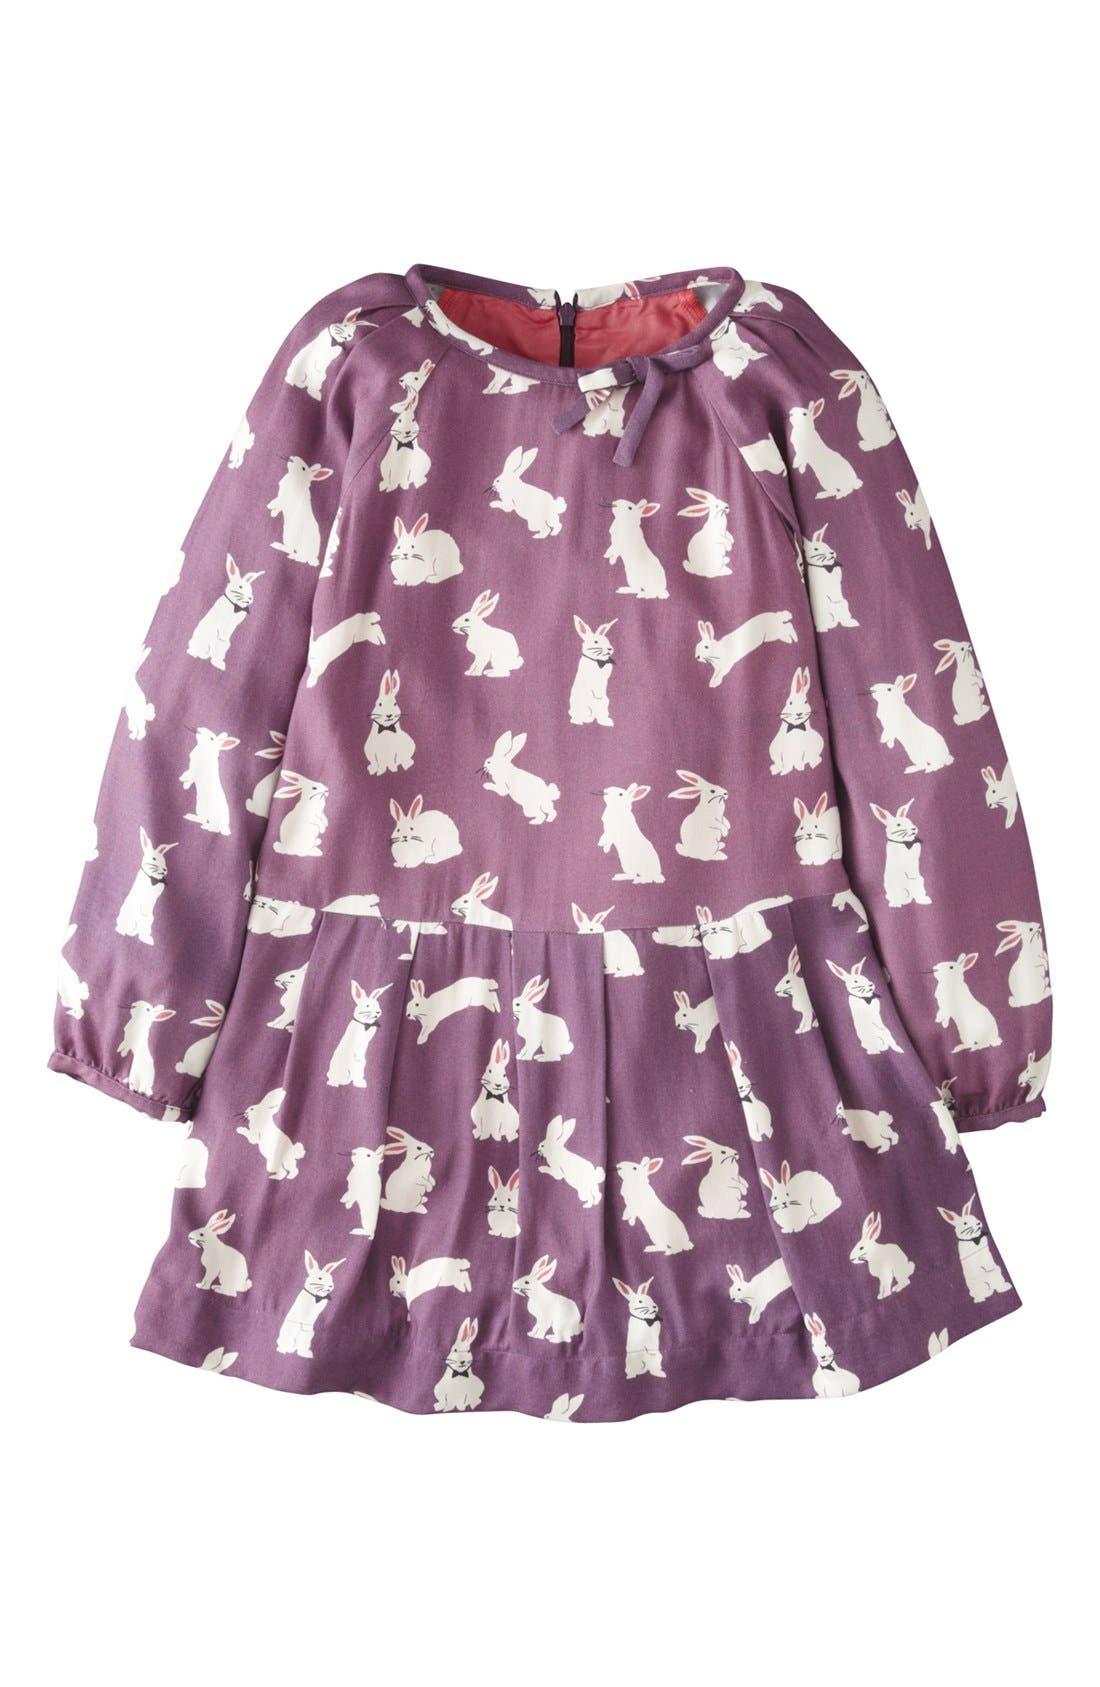 Main Image - Mini Boden 'Twenties' Long Sleeve Dress (Little Girls & Big Girls)